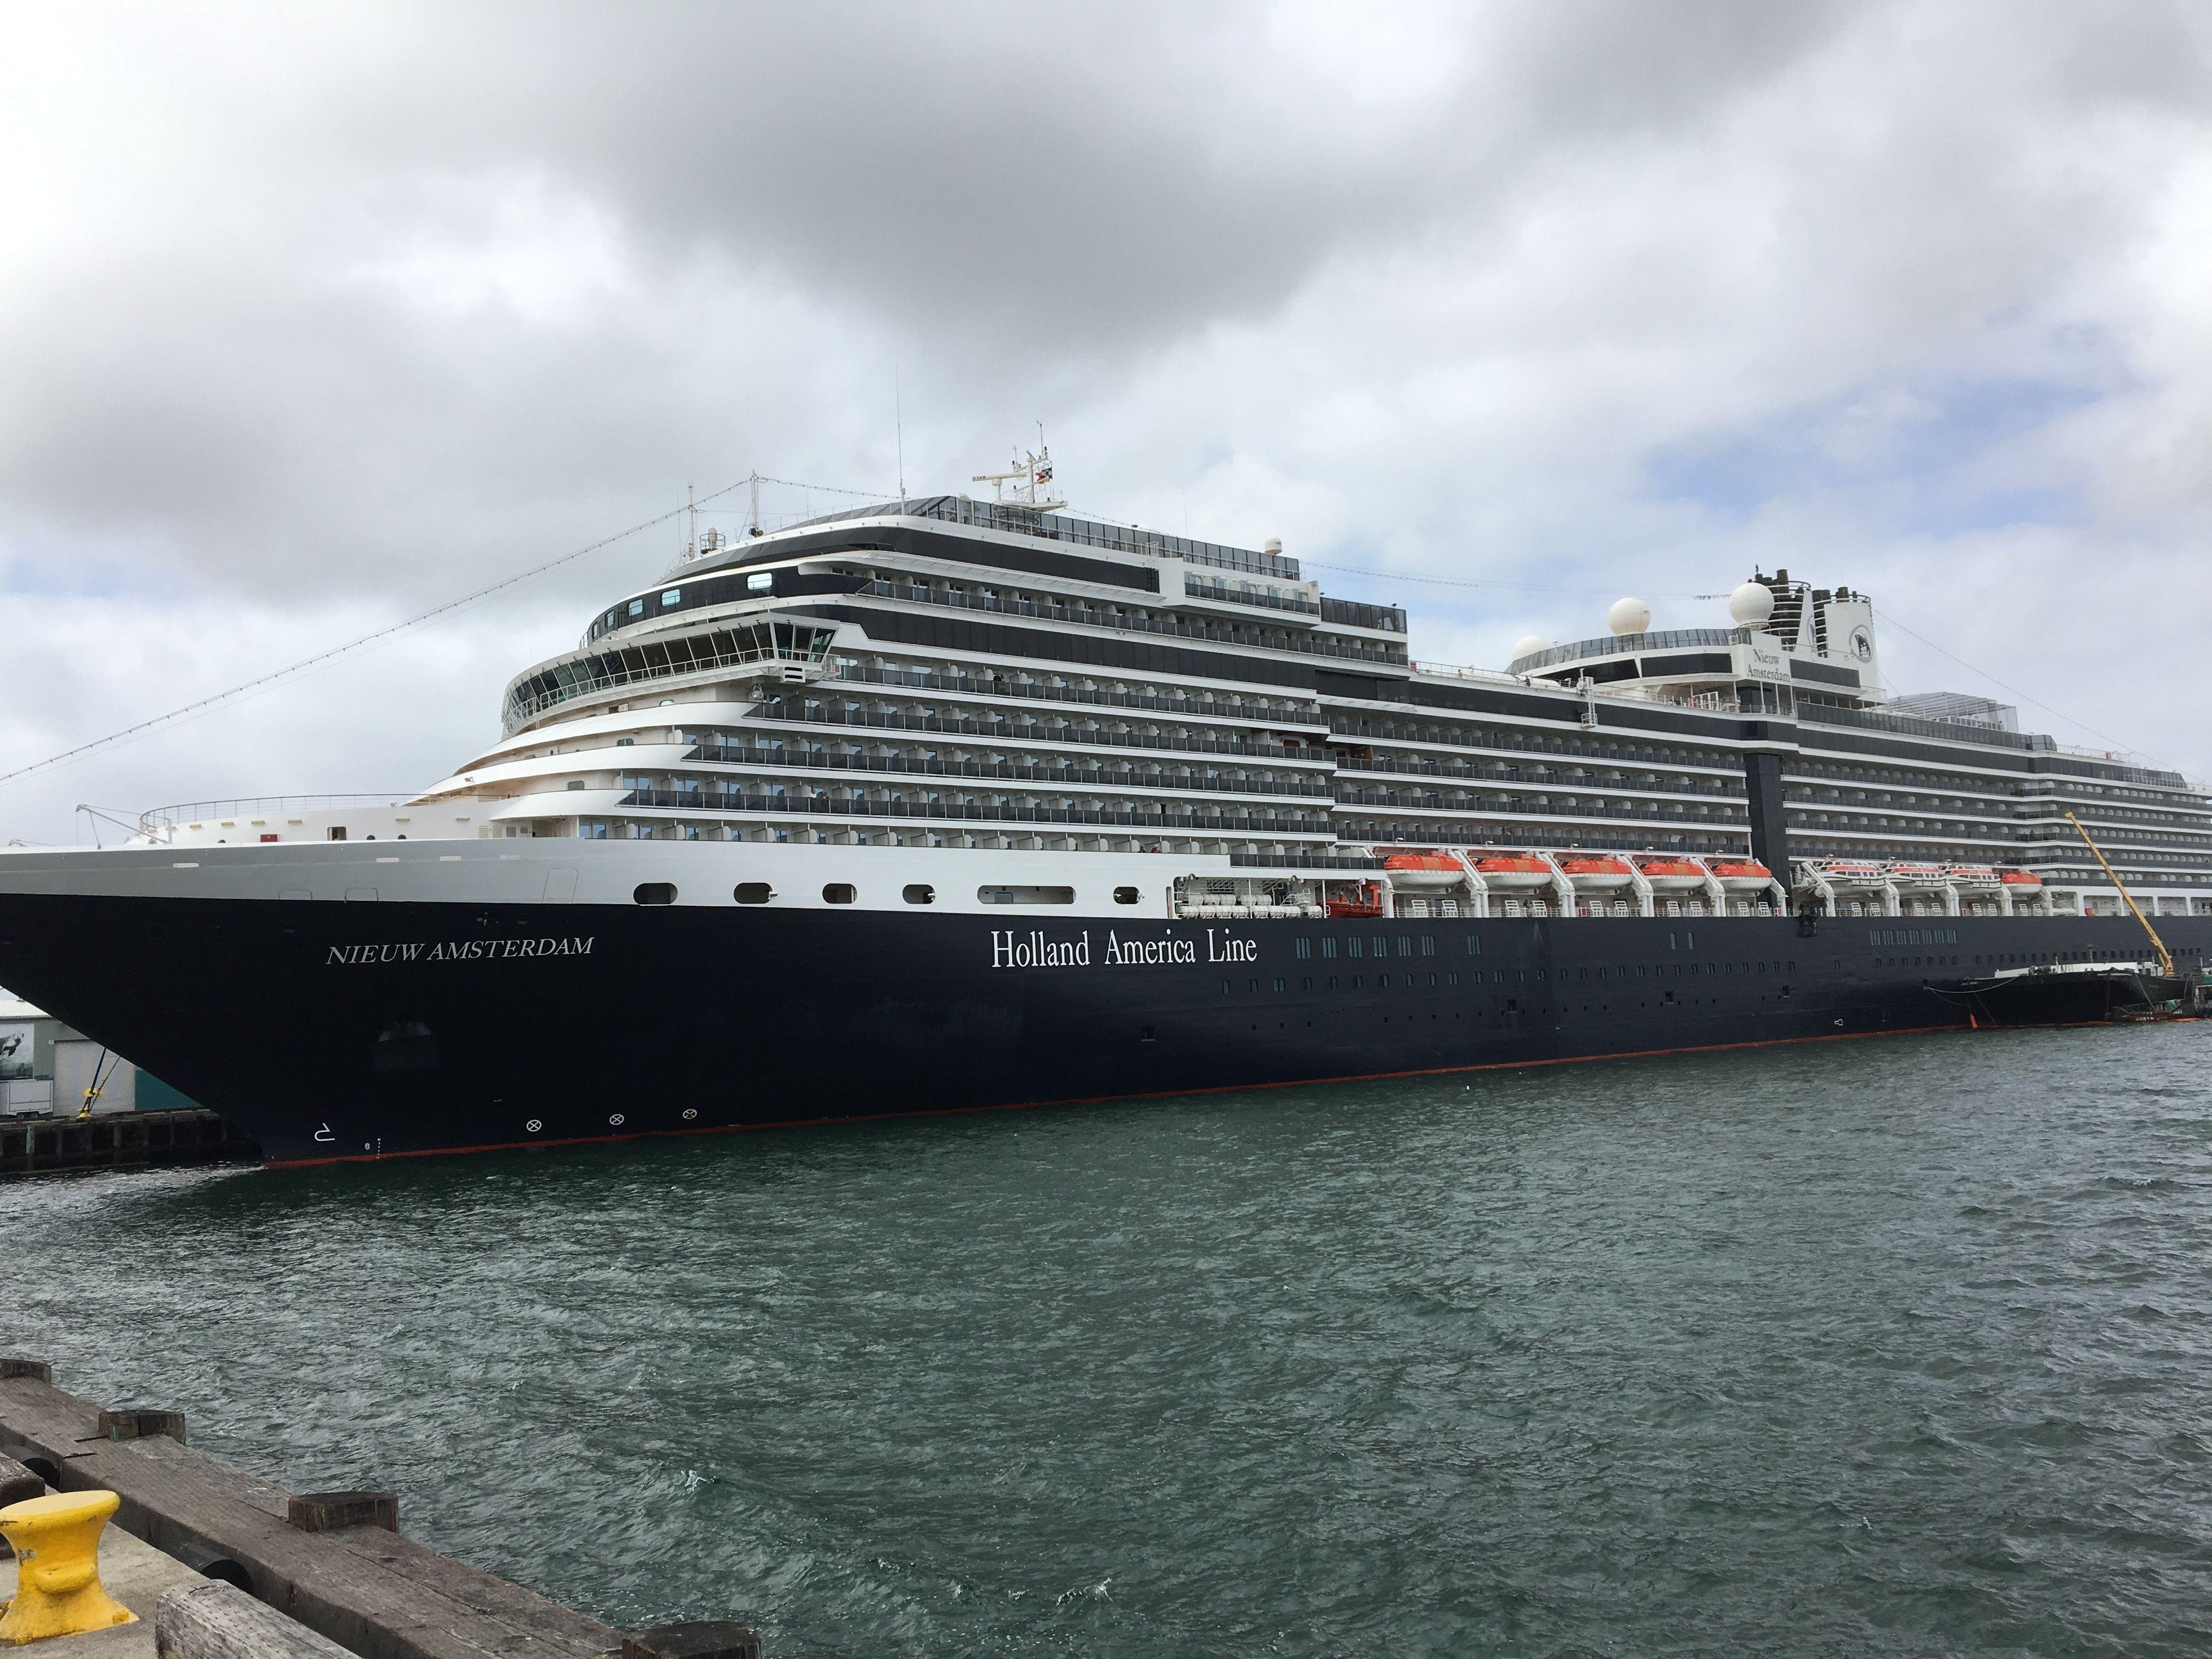 Holland America Ms Nieuw Amsterdam Wwwextramiletravelcom - Amsterdam cruise ship